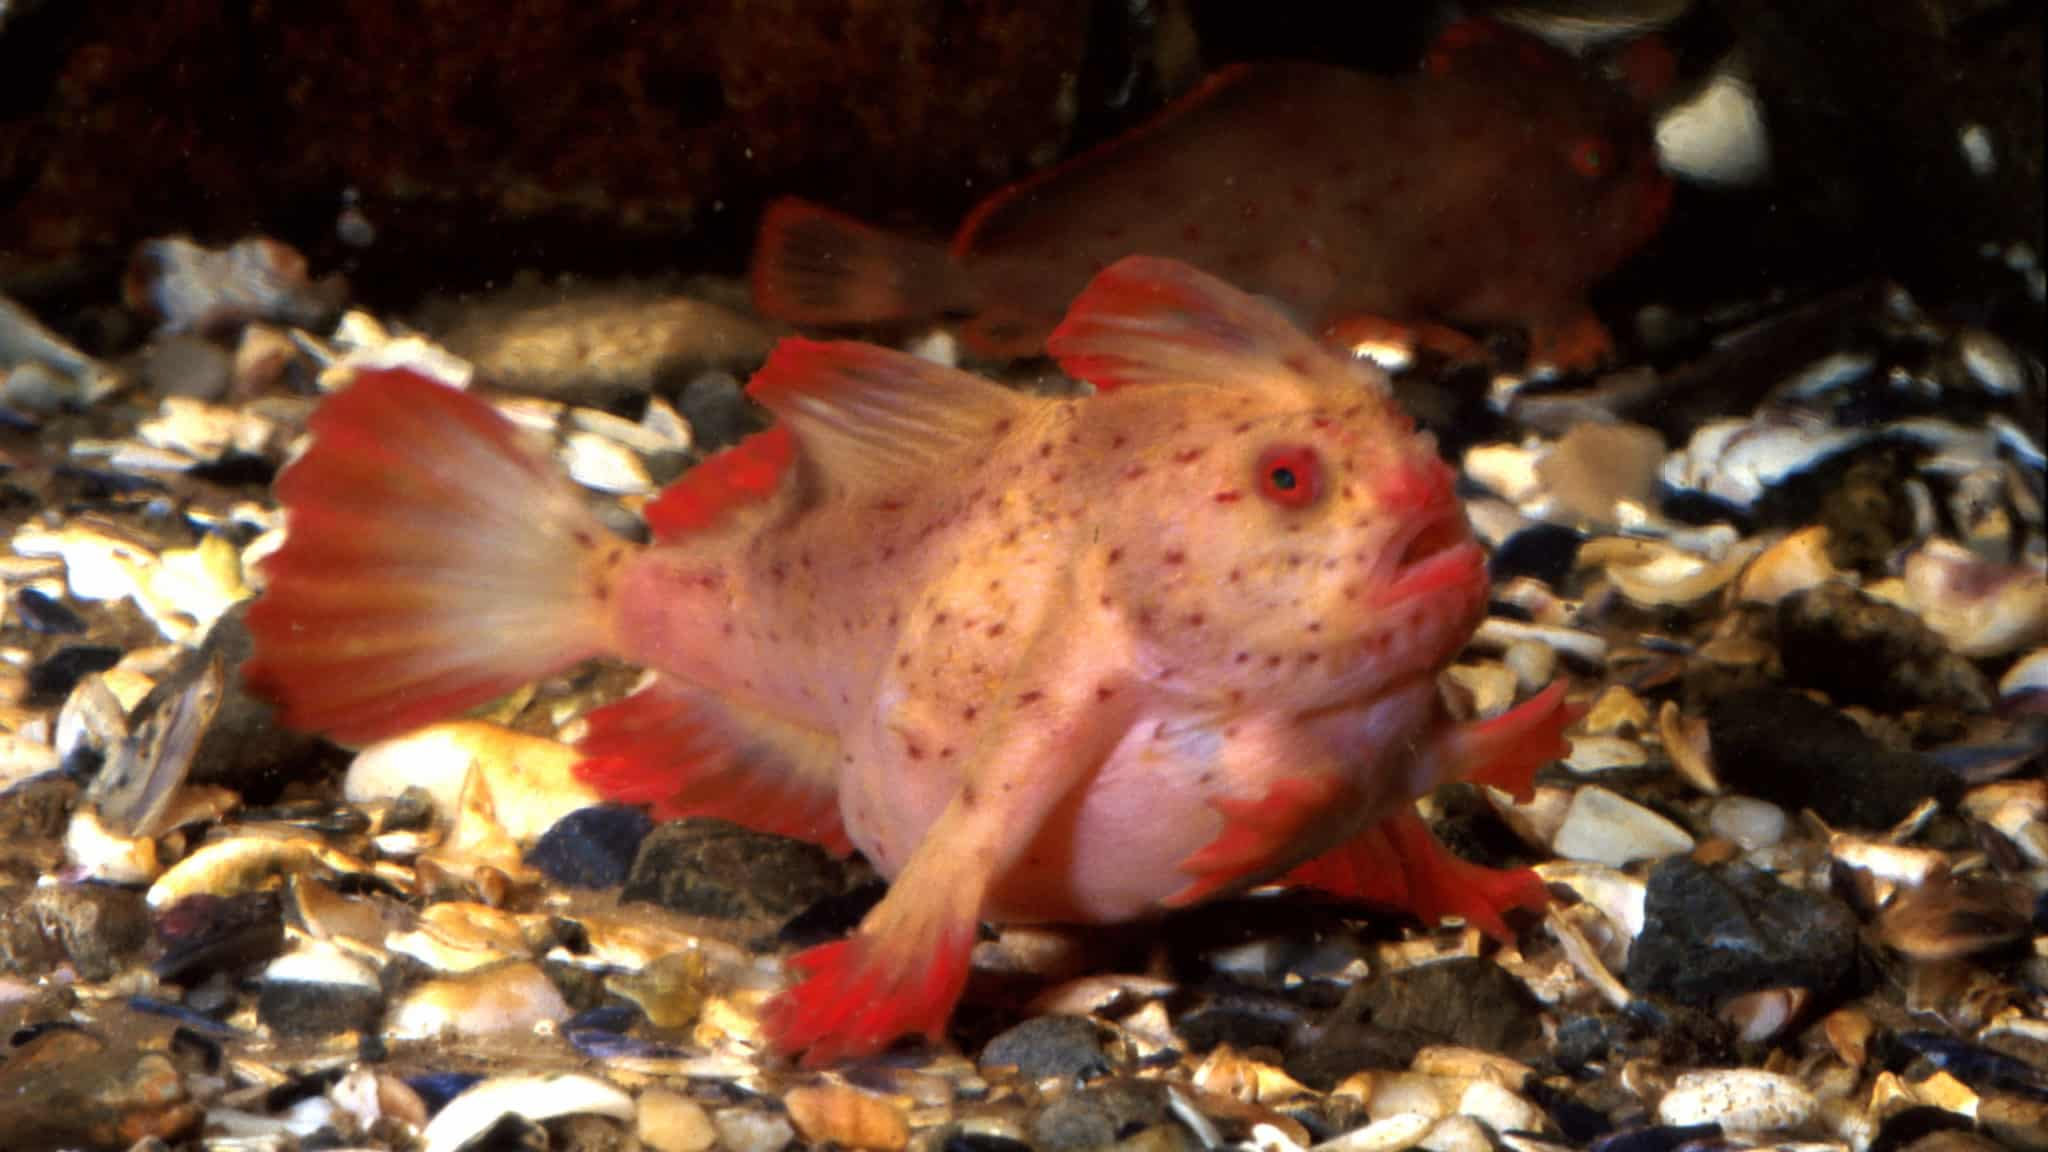 The unusual Red Handfish